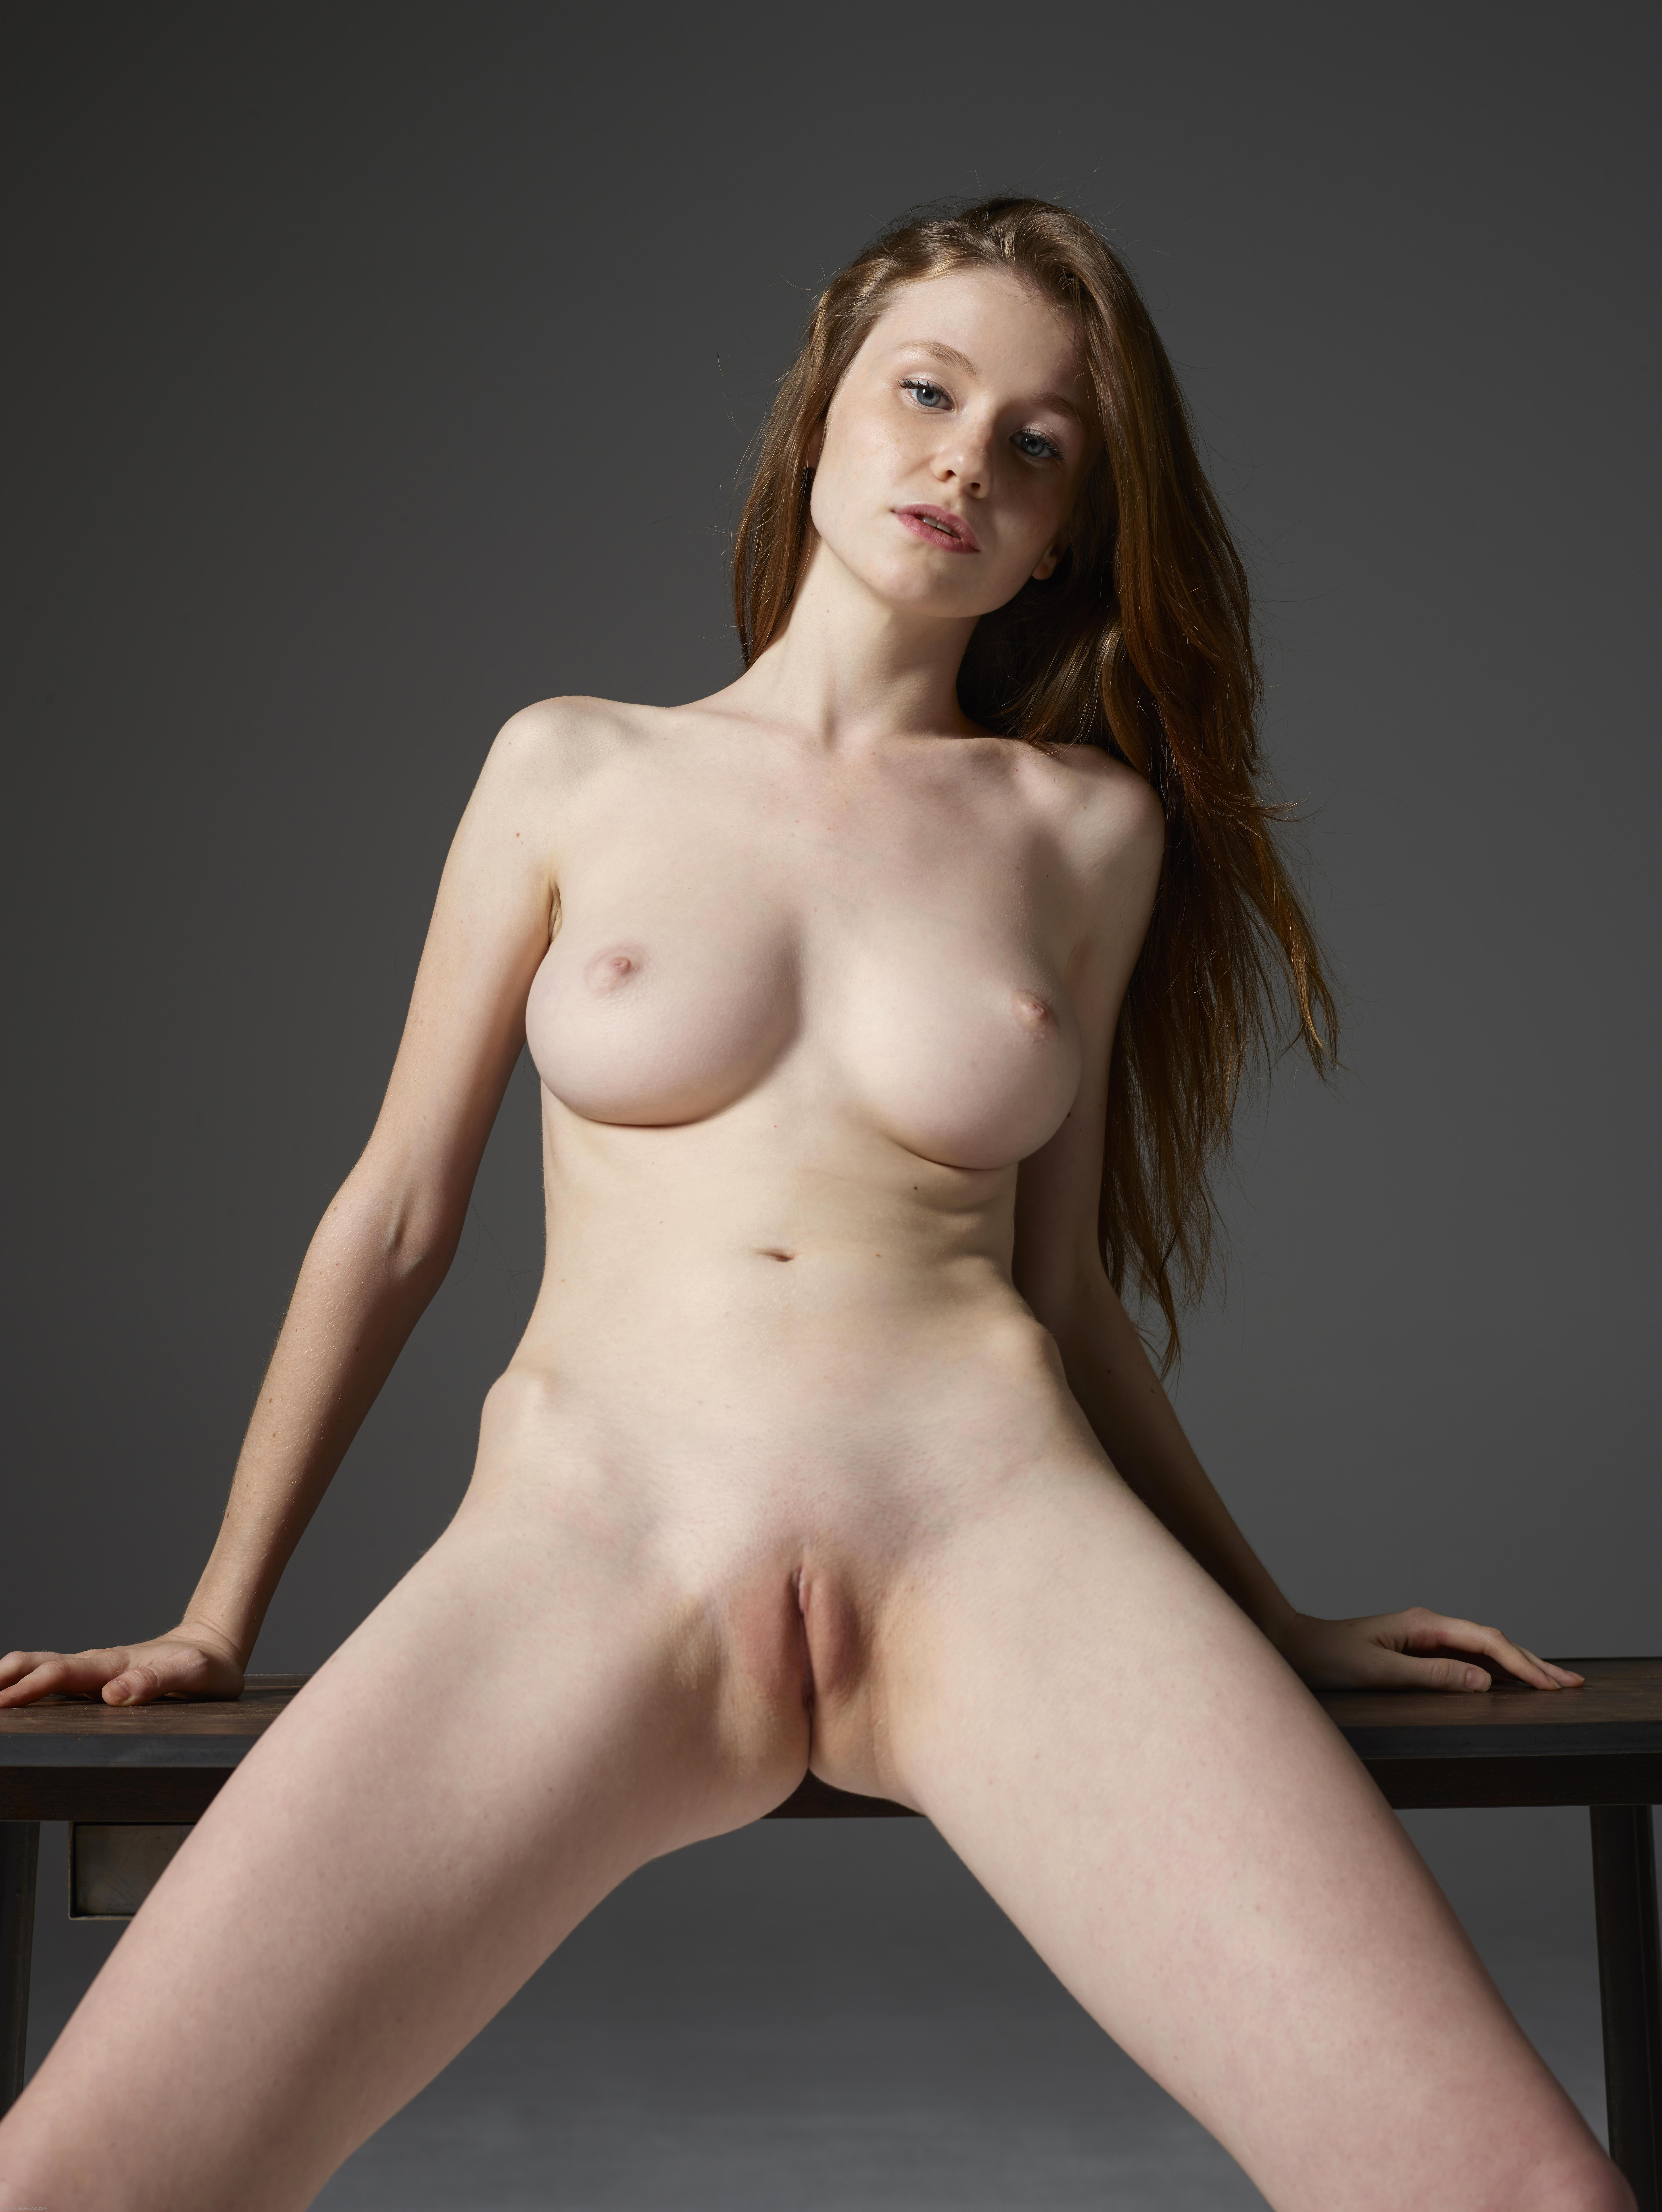 hegre art alya pic 2   naked girls